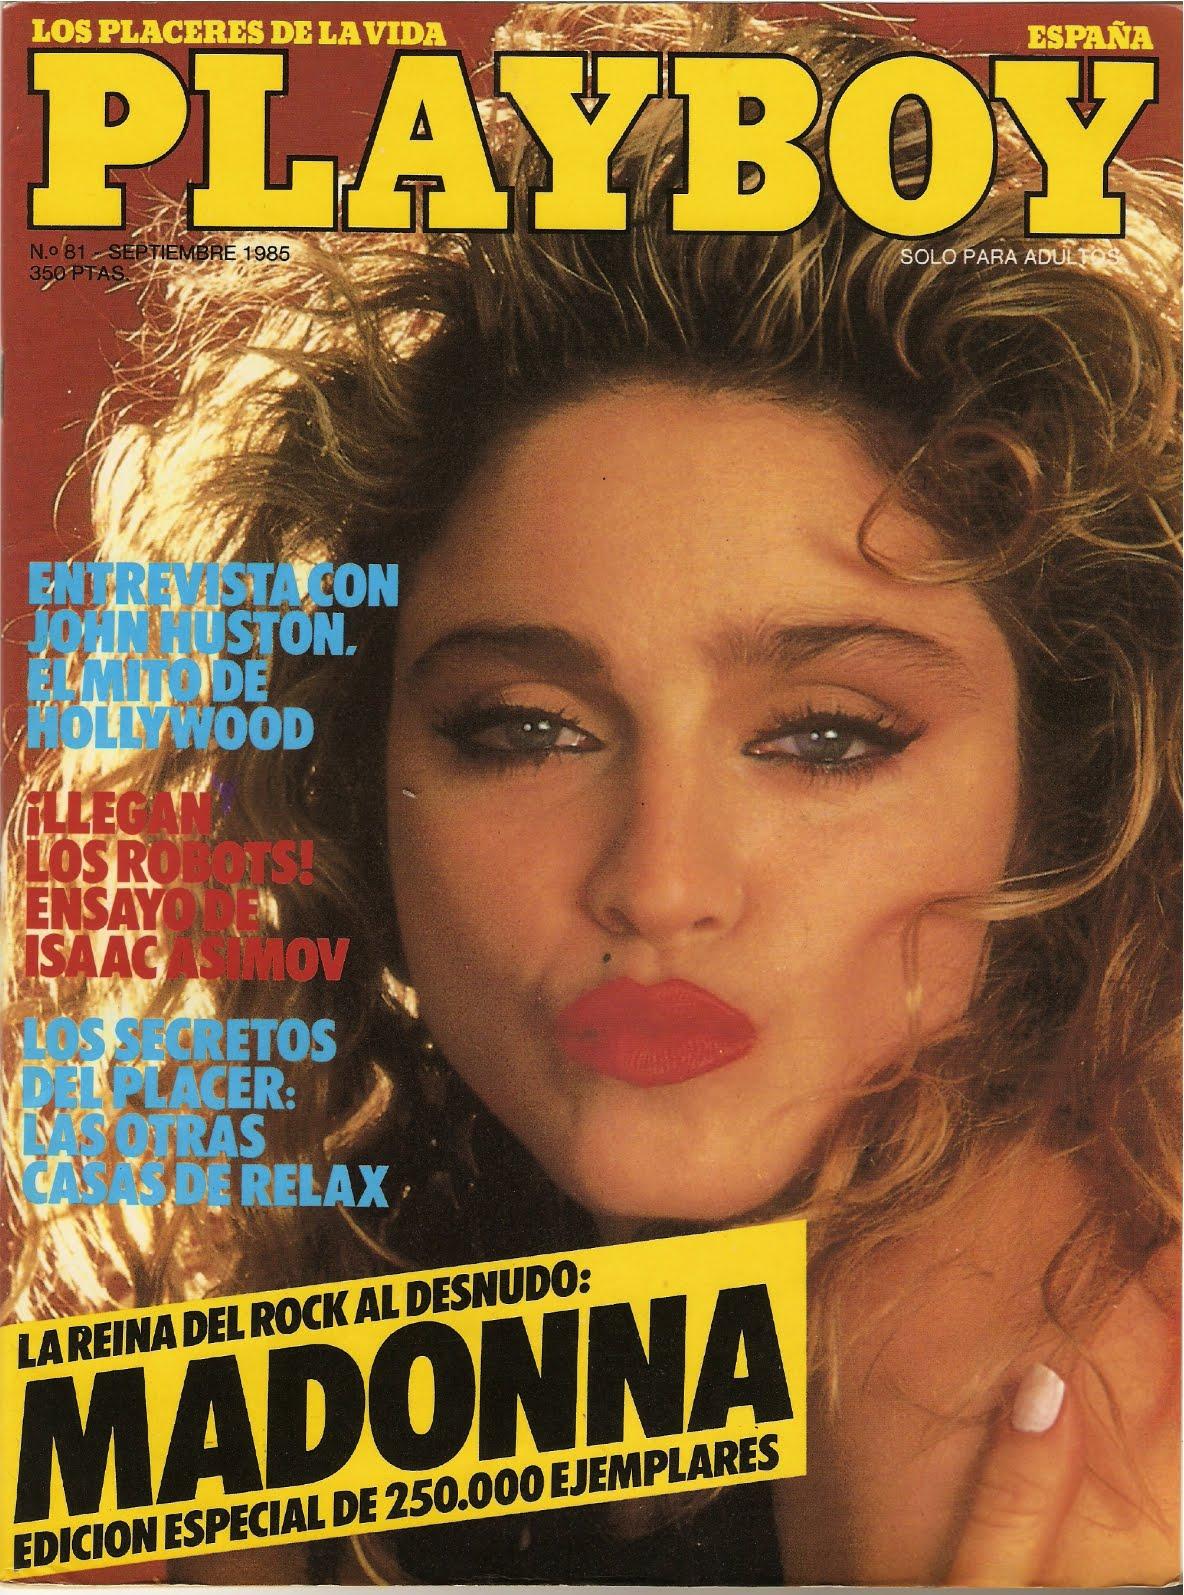 http://2.bp.blogspot.com/_Bs1pXxAZsr0/S7Lwi0YuWAI/AAAAAAAANTE/4csNlOfXOV8/s1600/ES_Playboy_1985_09.jpg